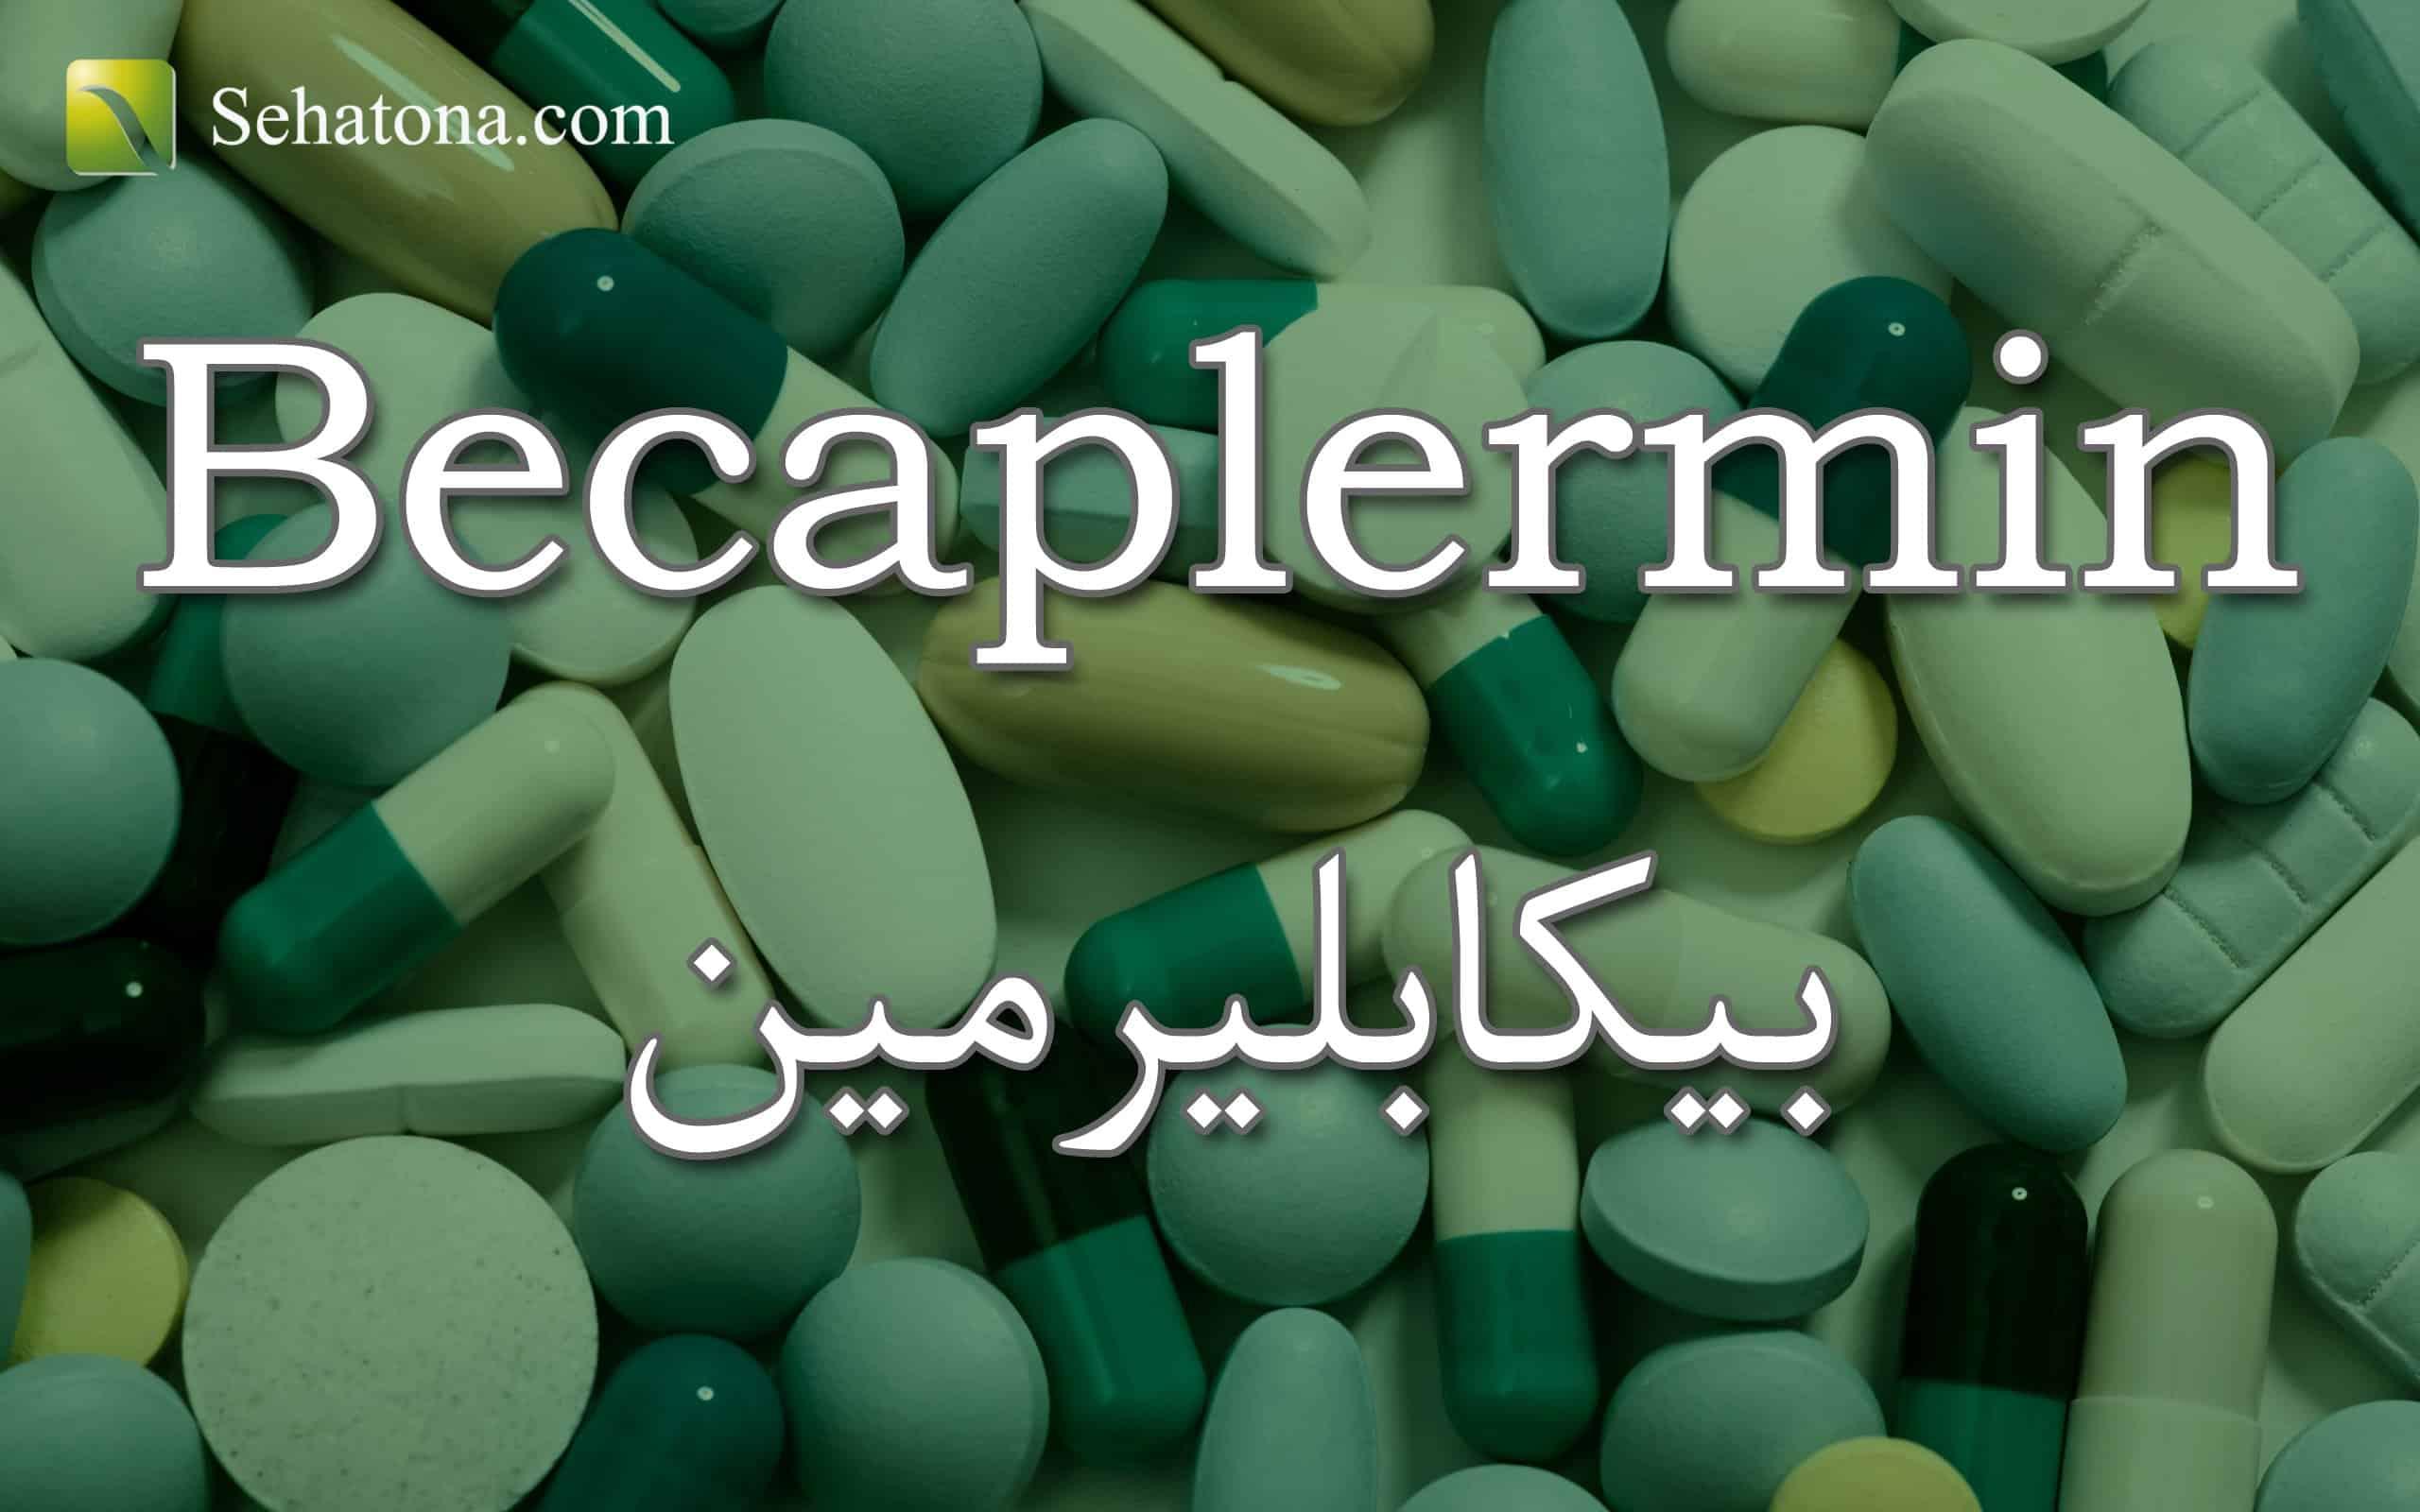 Becaplermin